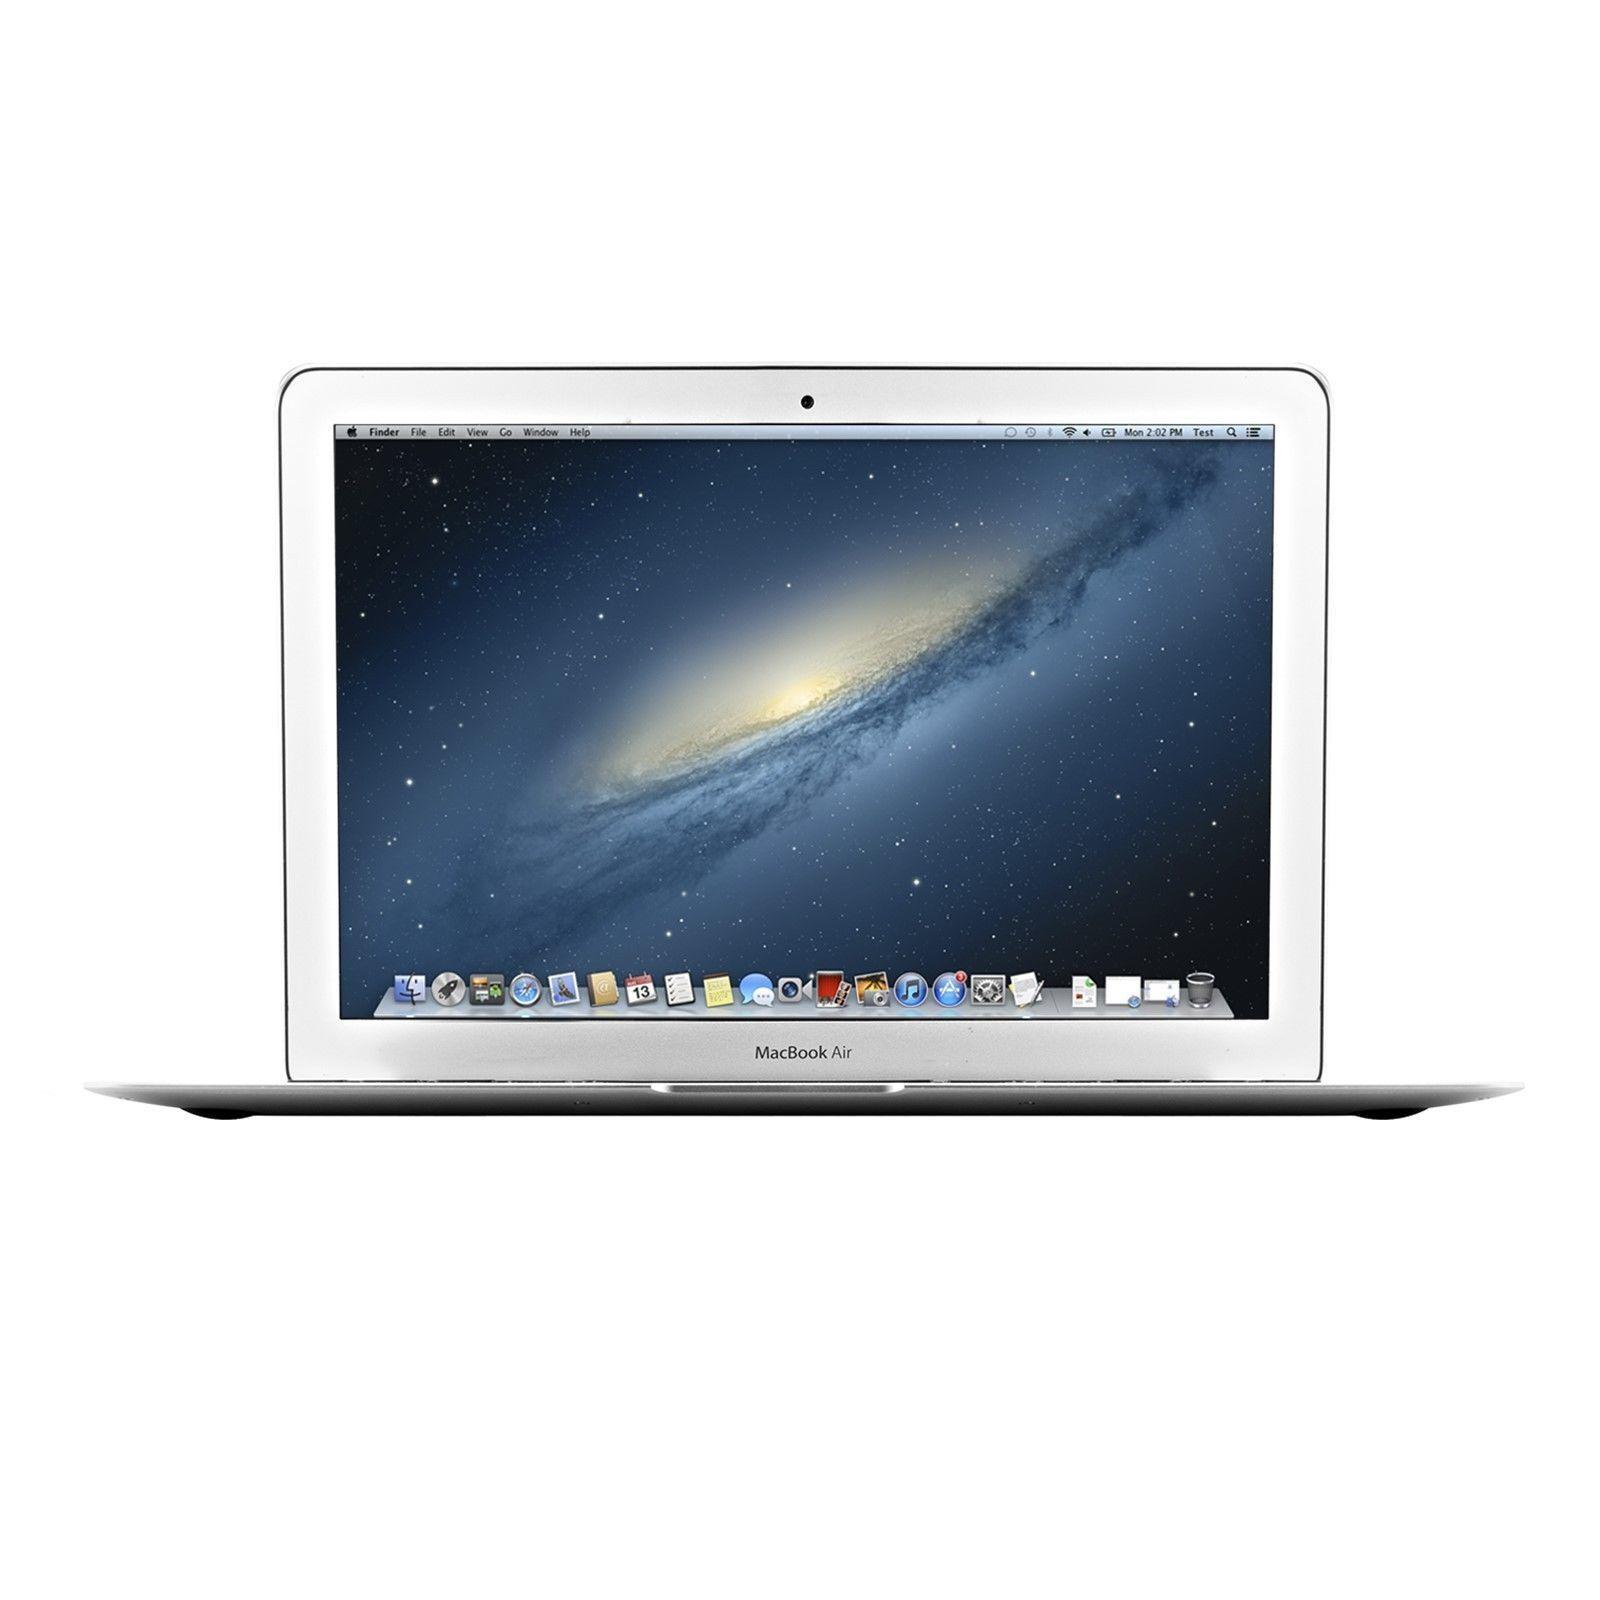 "Apple MacBook Air 13"" MD760LL/B  4GB 128GB Laptop"